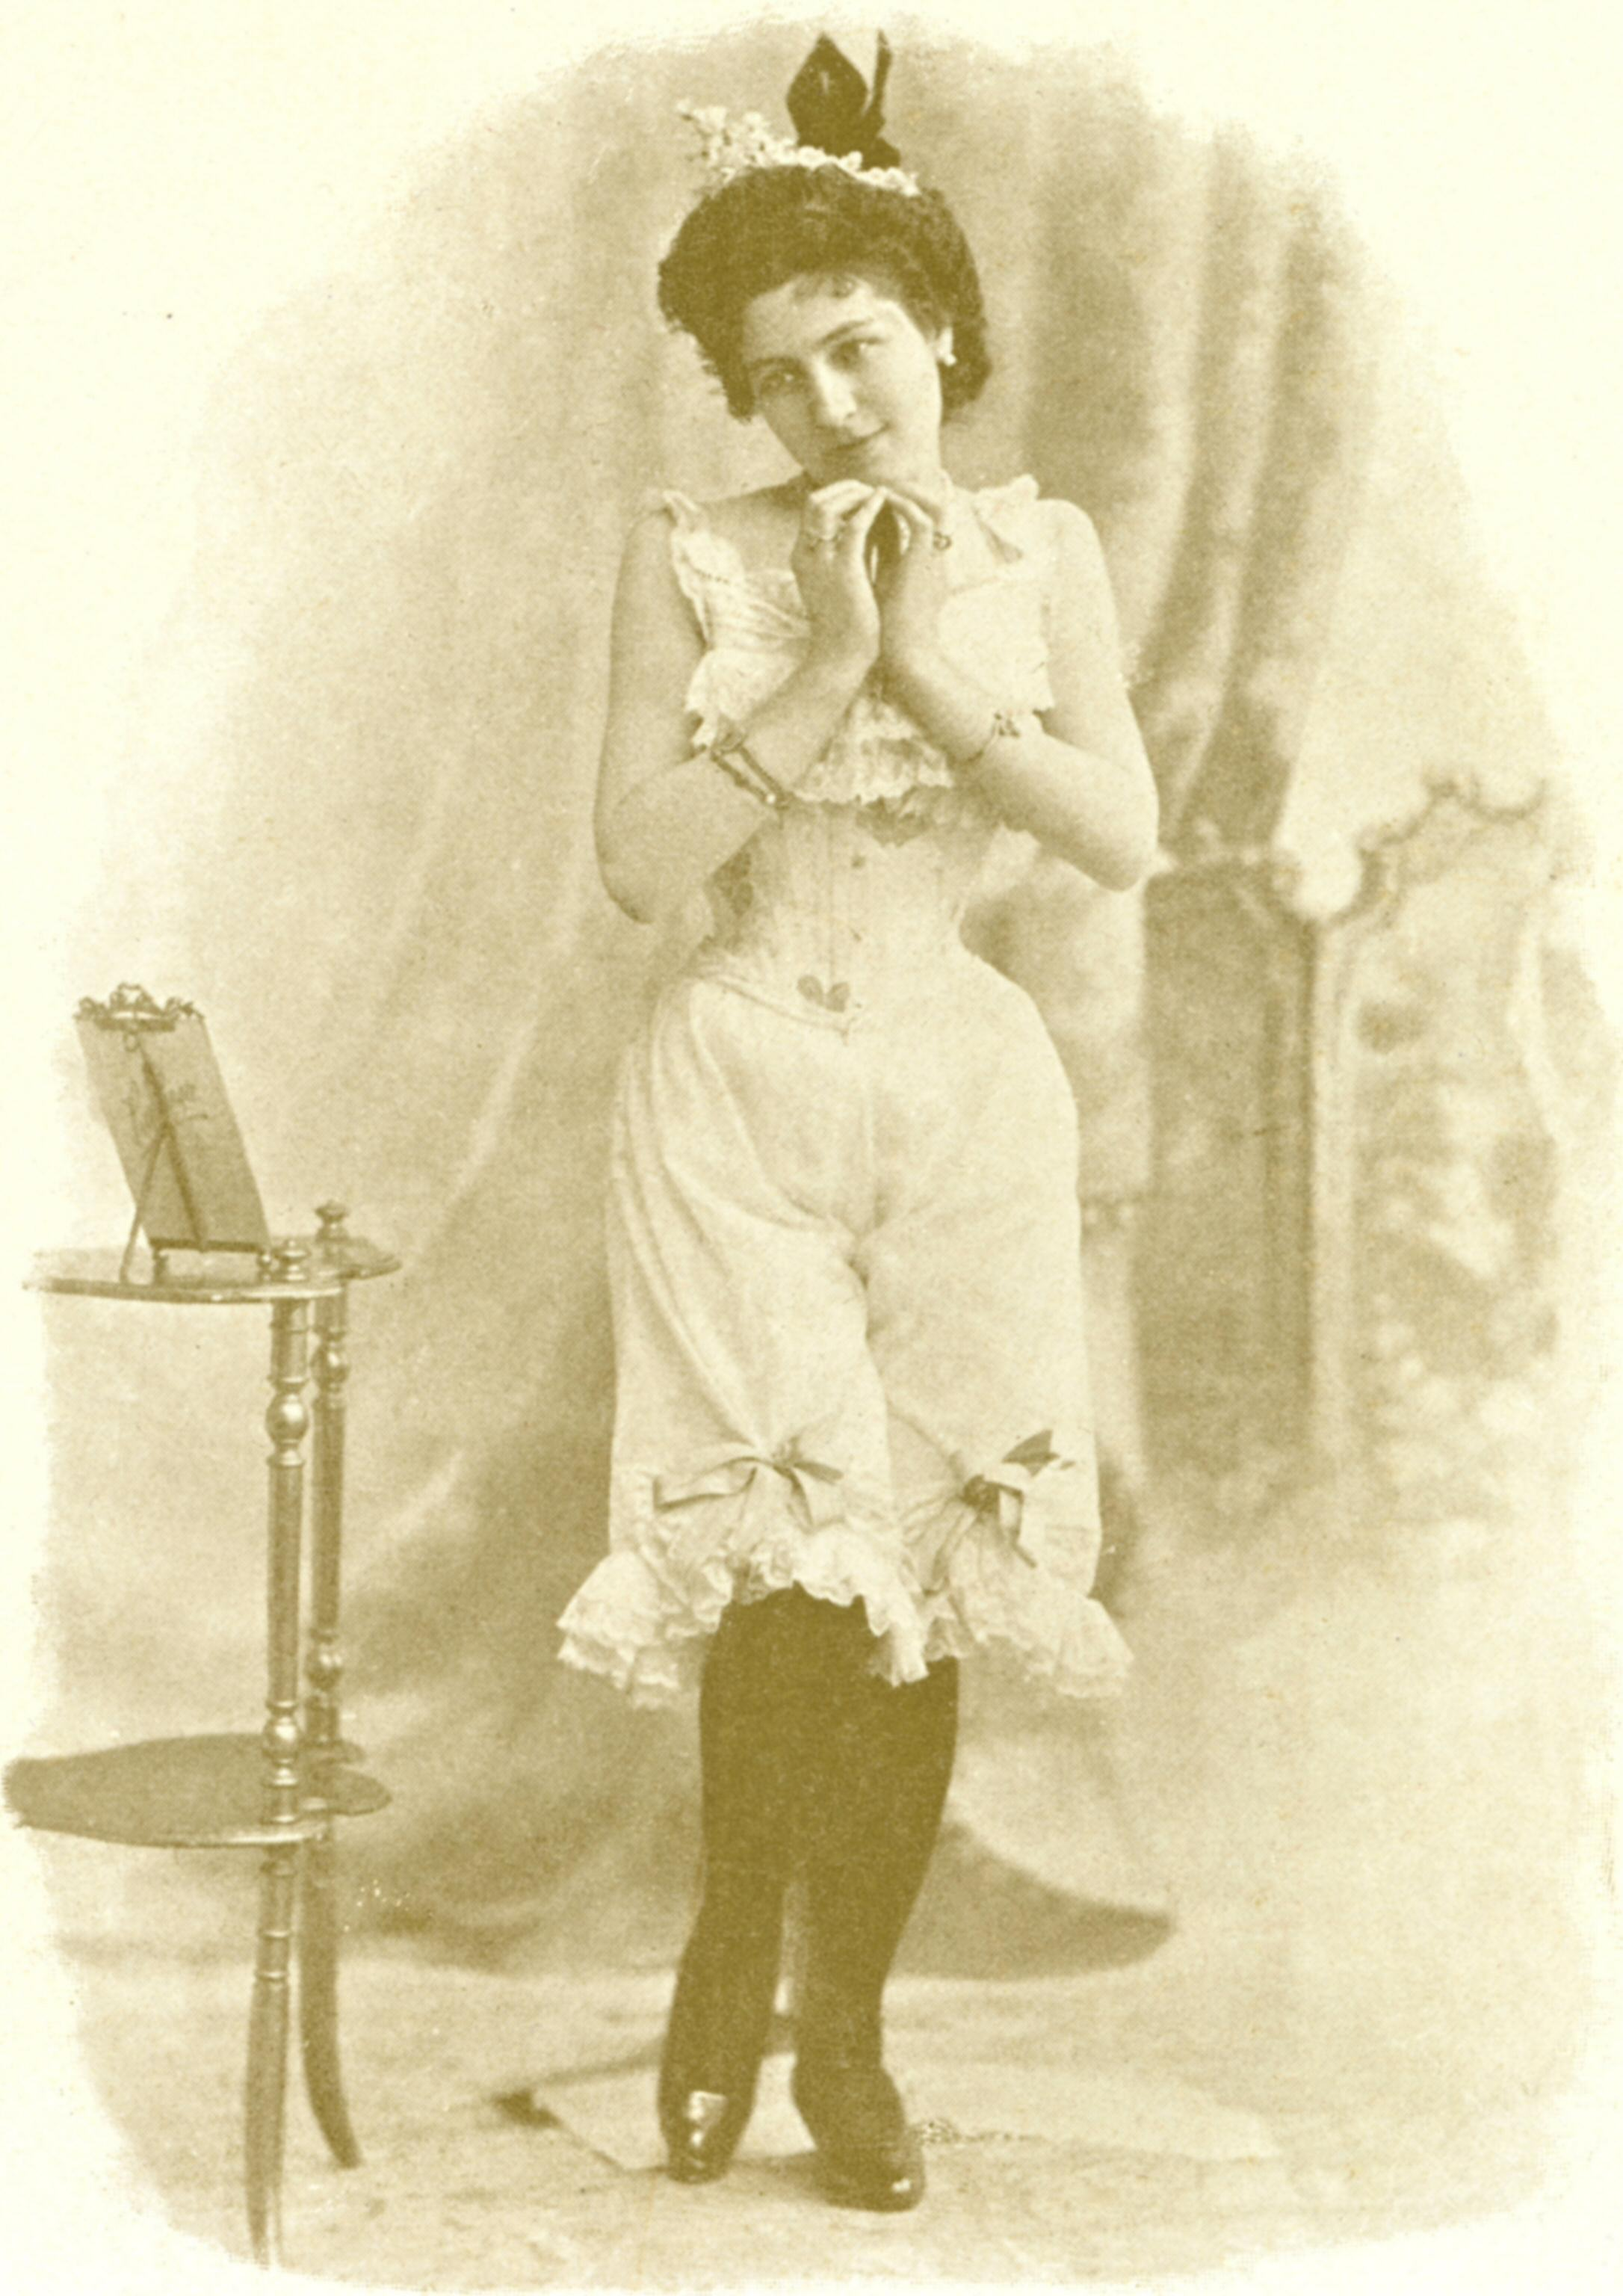 http://upload.wikimedia.org/wikipedia/commons/2/21/She_miss_you4.jpg